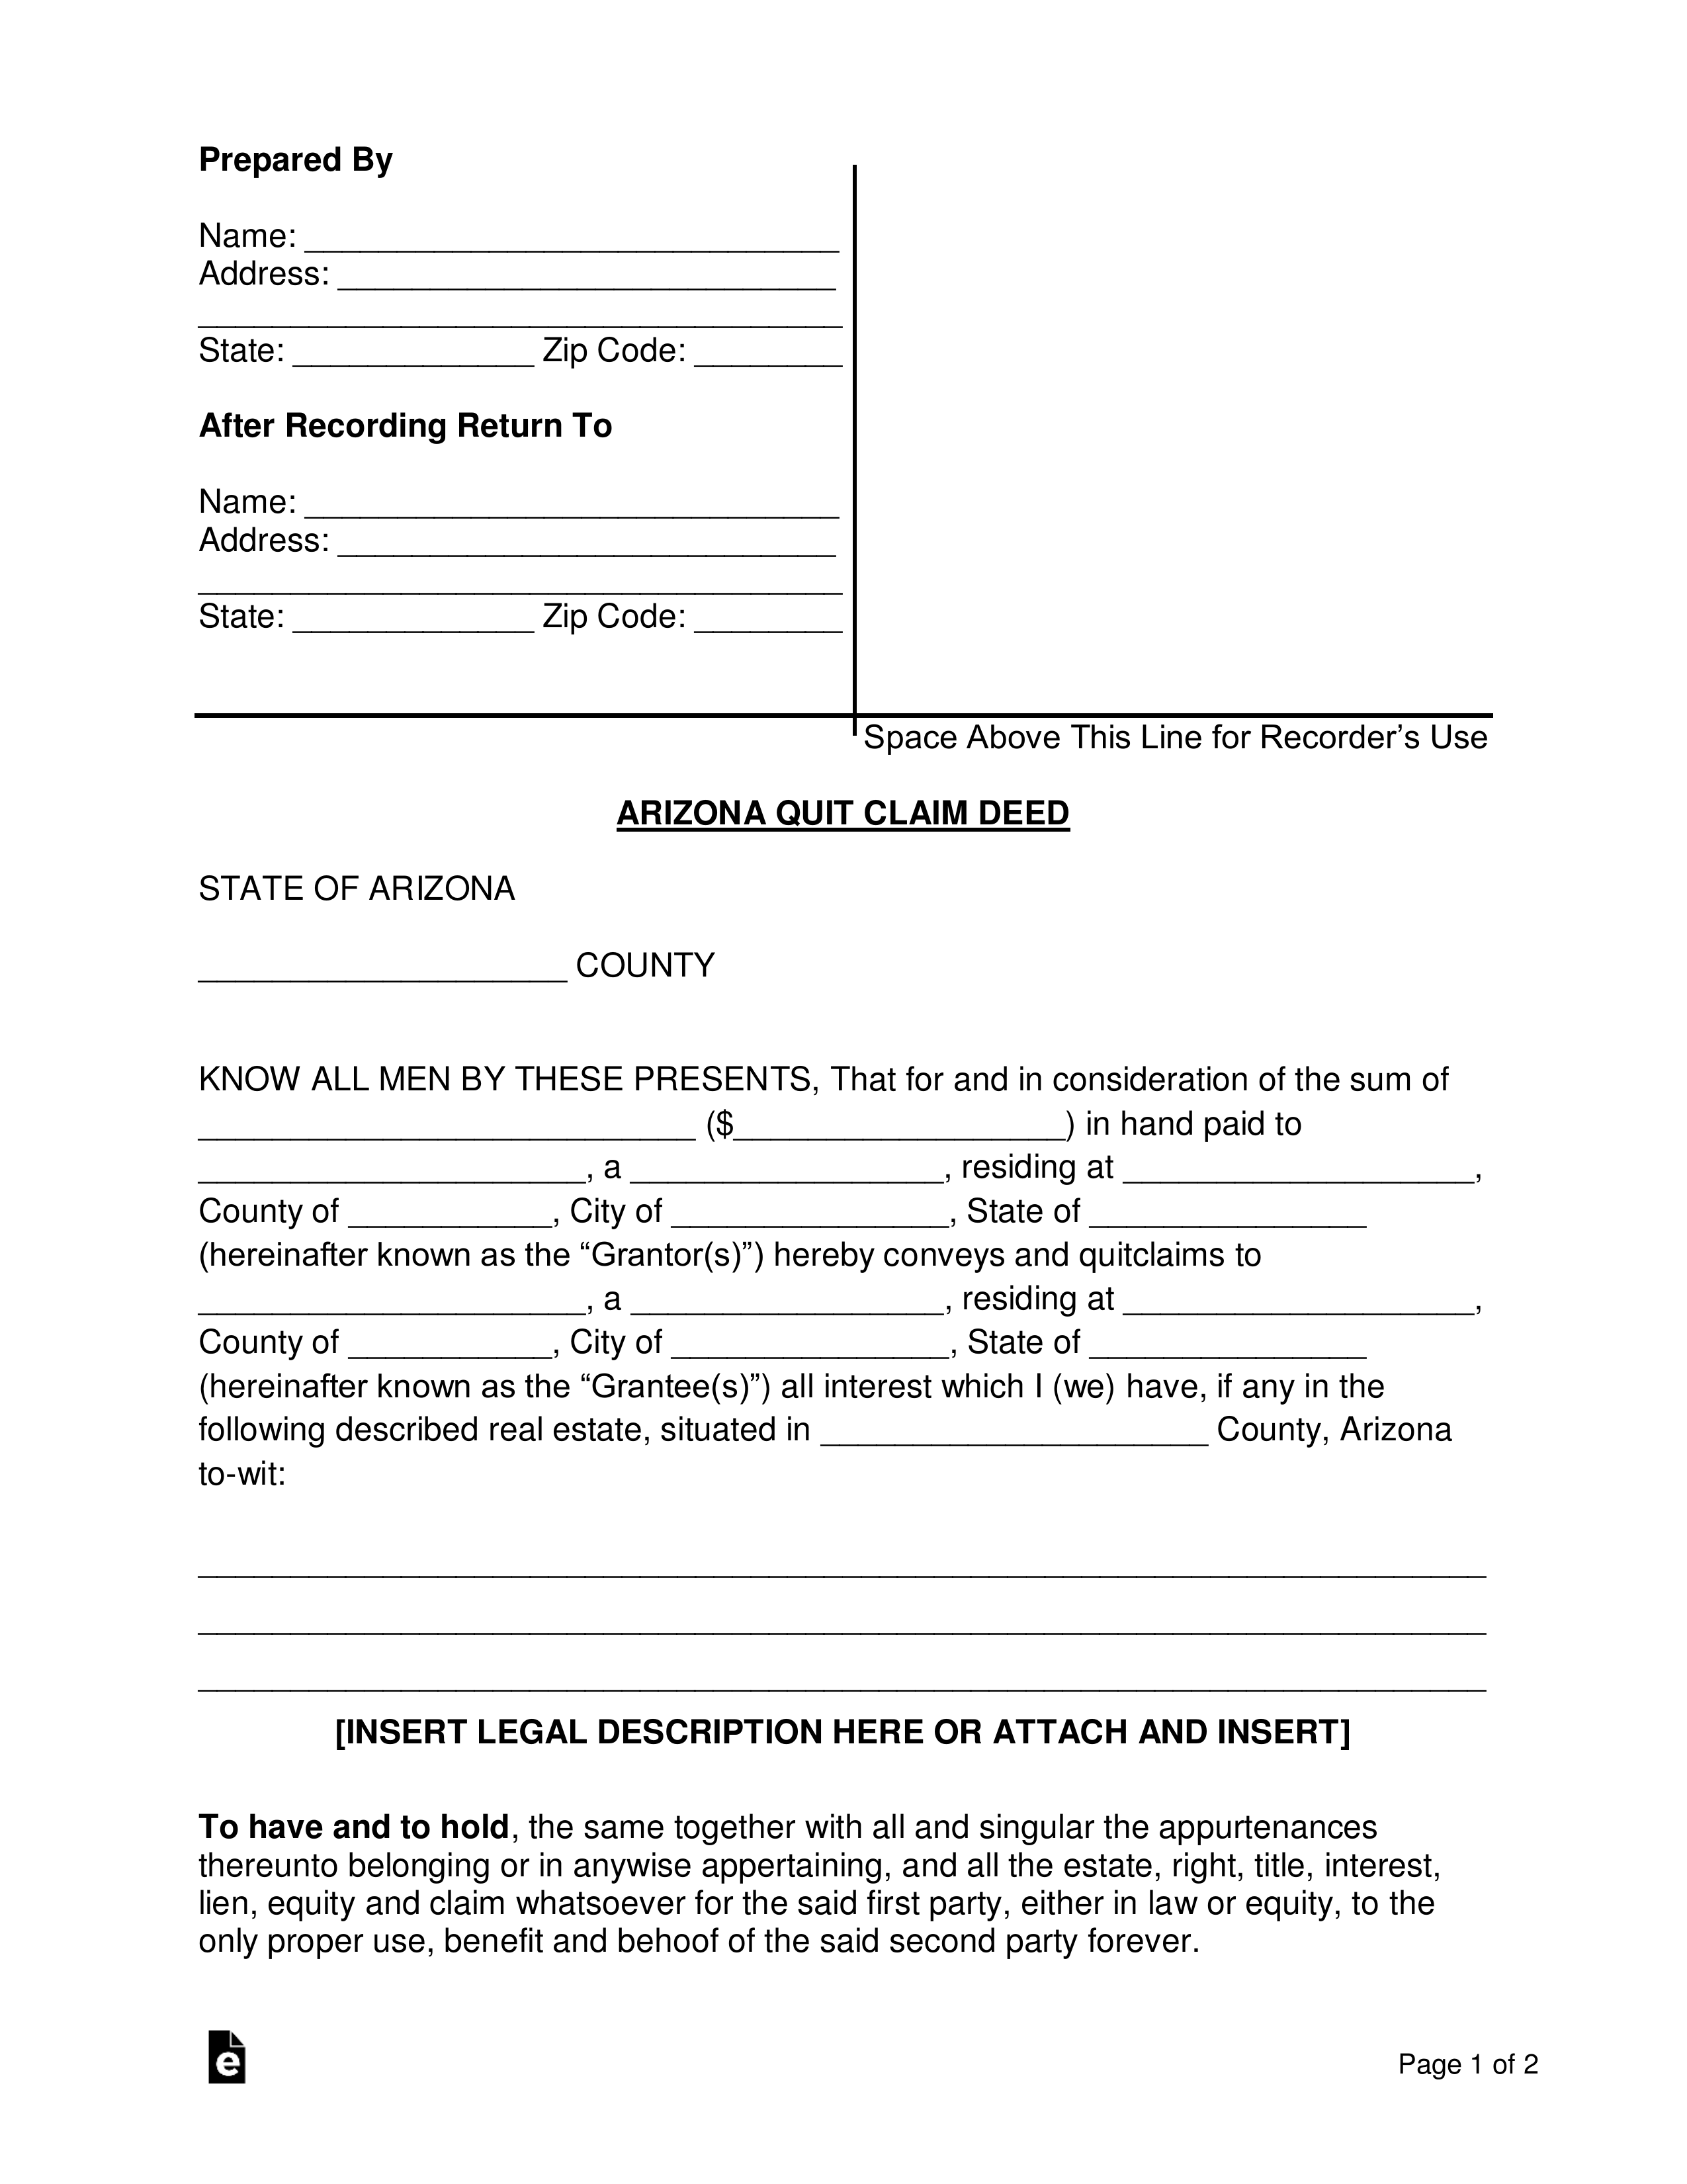 Free Arizona Quit Claim Deed Form - Word | PDF | eForms